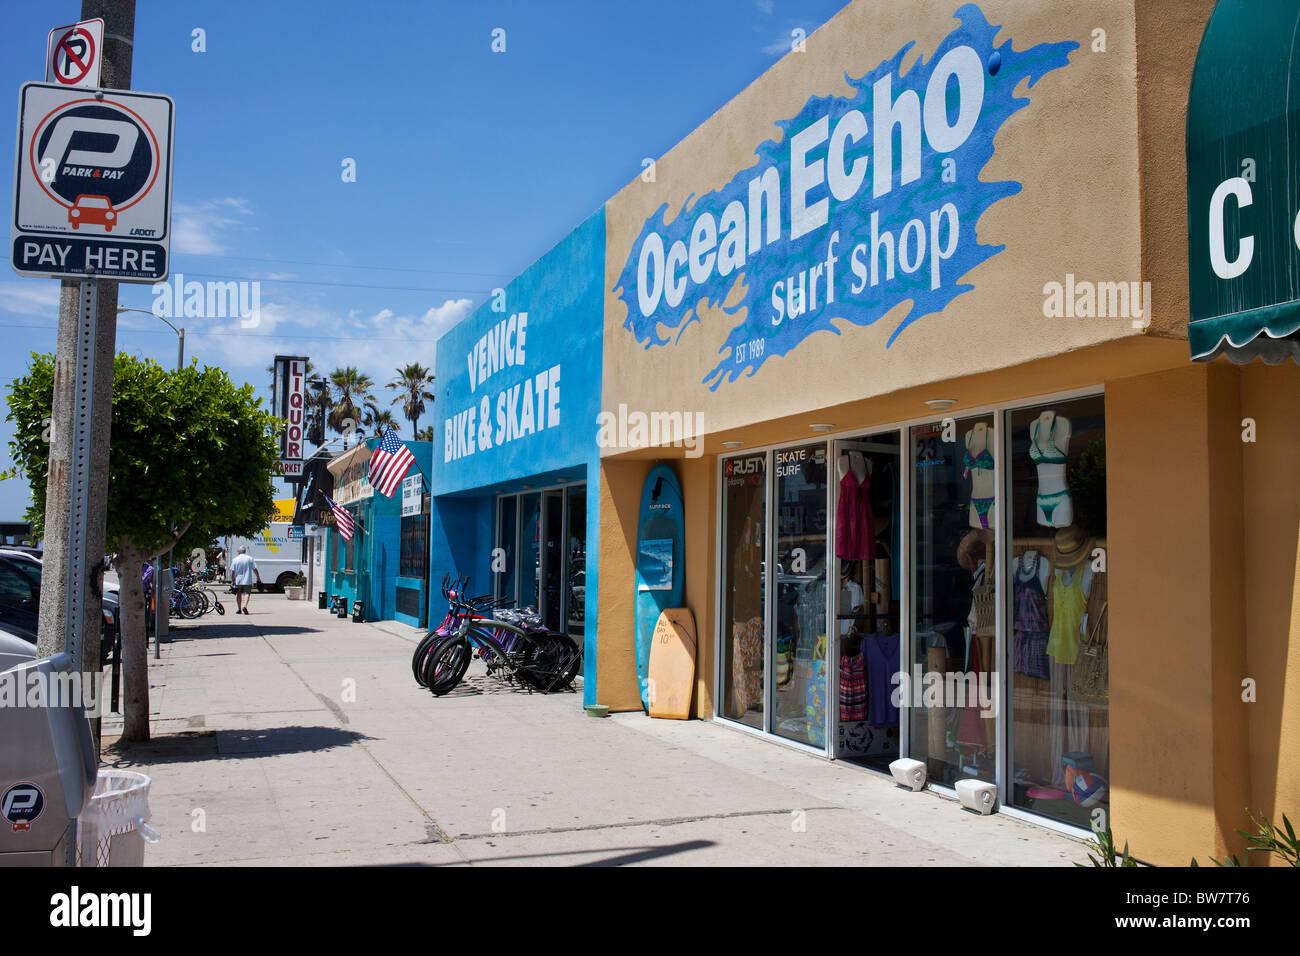 Ocean Echo surf shop in Venice beach California established in 1989 - Stock Image